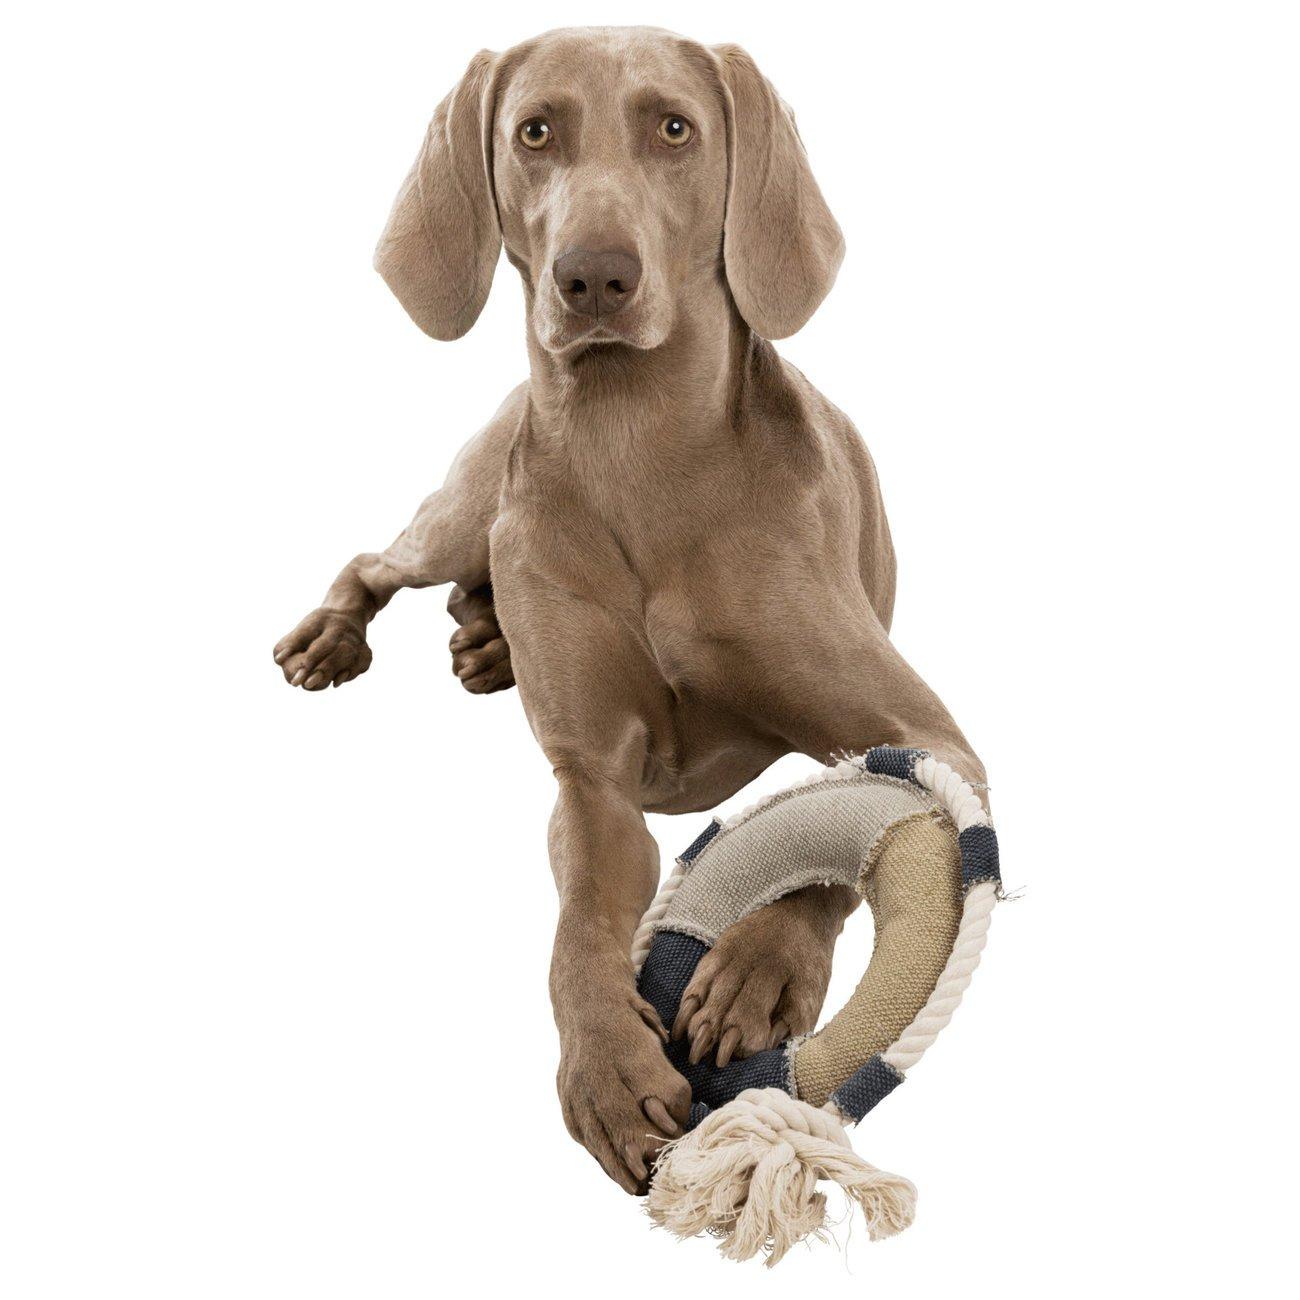 Trixie BE NORDIC Rettungsring, Hundespielzeug 35652, Bild 4